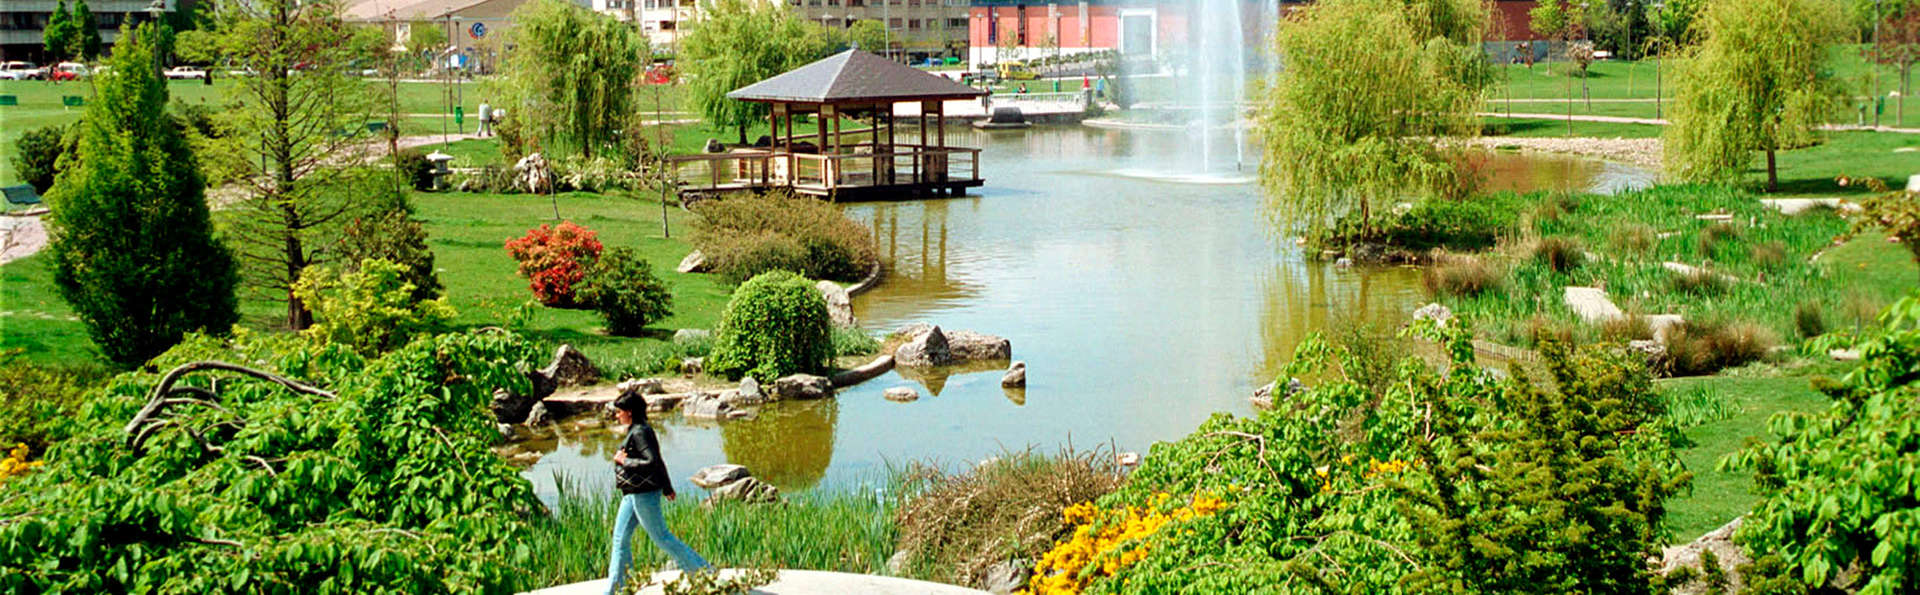 Abba Reino de Navarra Hotel - EDIT_destination.jpg